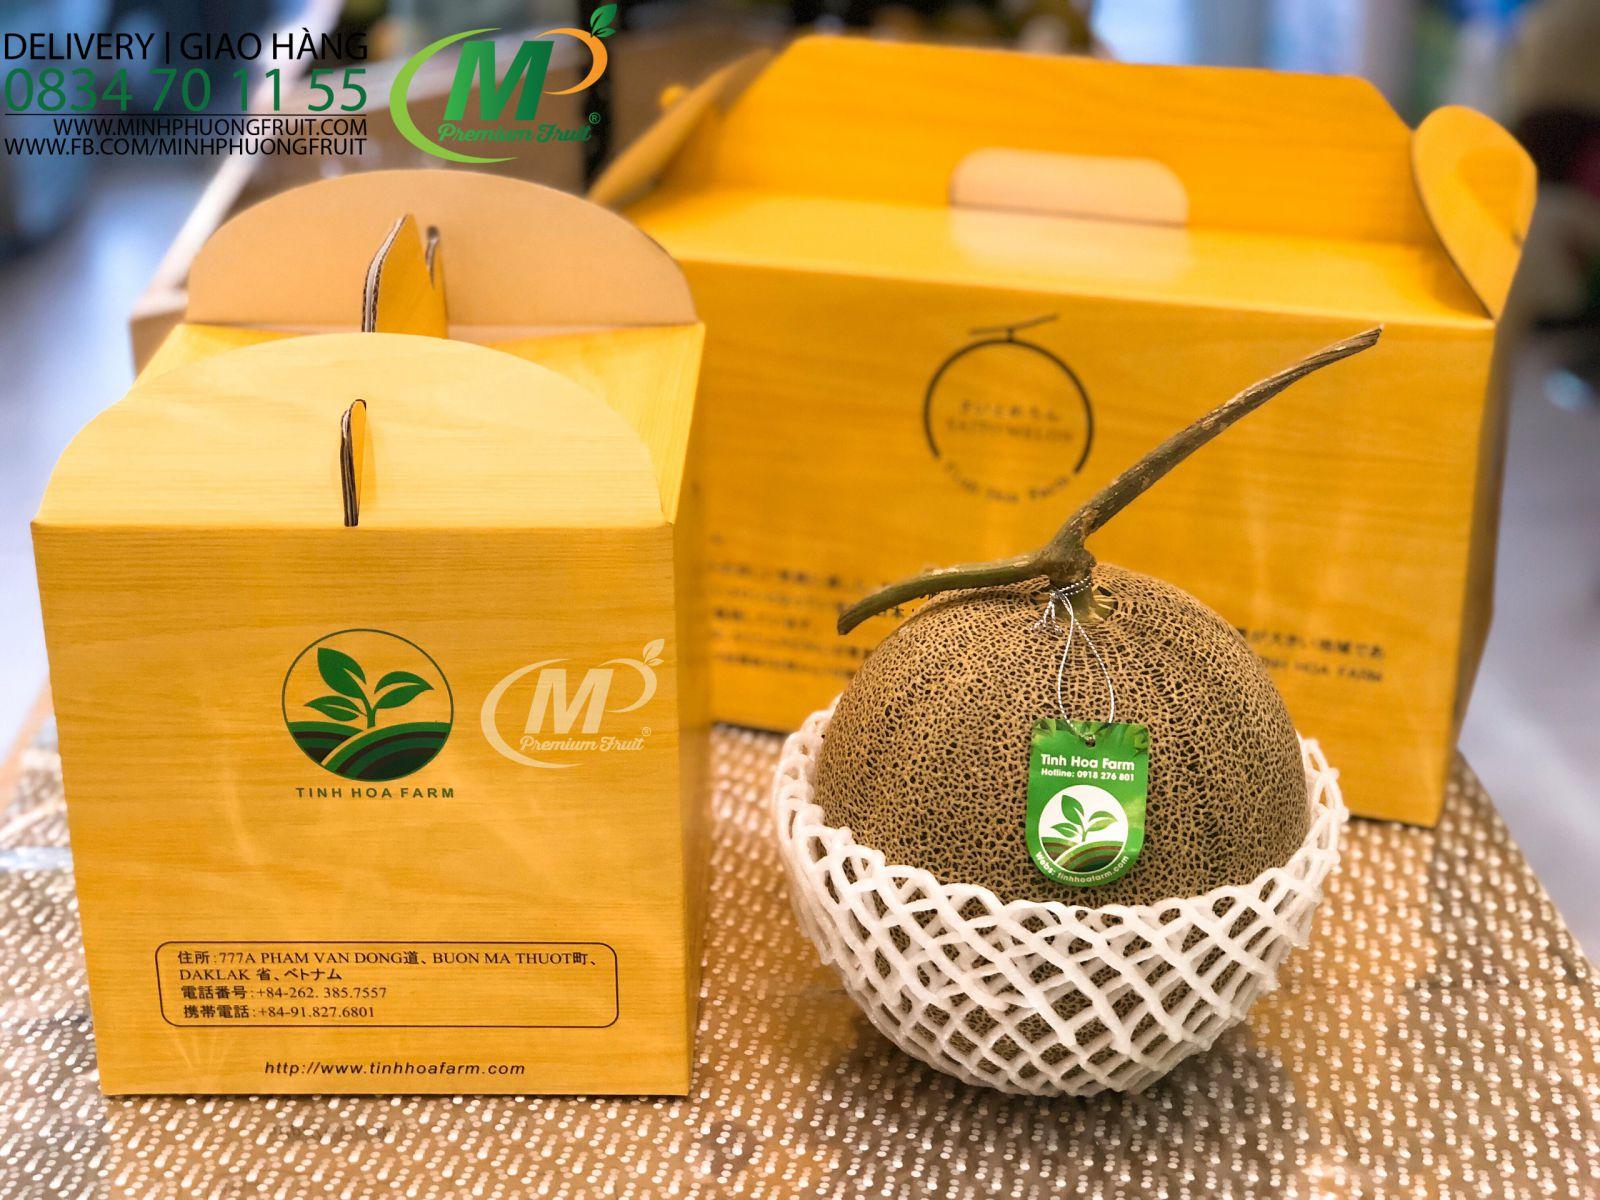 Dưa Lưới Nhật Saito Blue Melon - MP Fruit